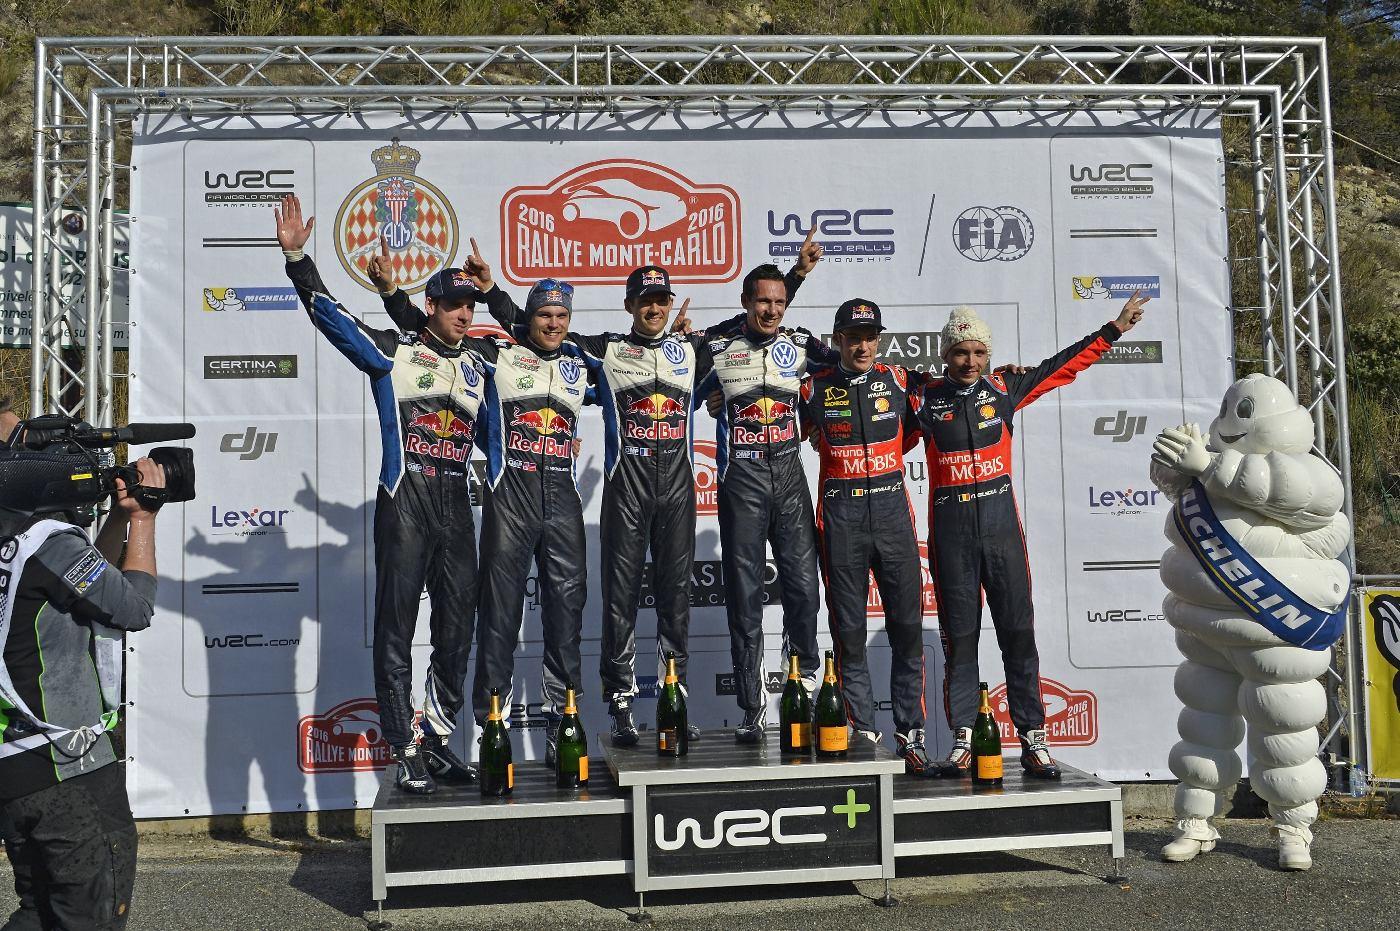 Anders Jæger (NOR), Andreas Mikkelsen (NOR), Sébastien Ogier (F), Julien Ingrassia (F), Thierry Neuville (B), Nicolas Gilsoul (B) WRC Rallye Monte Carlo 2016